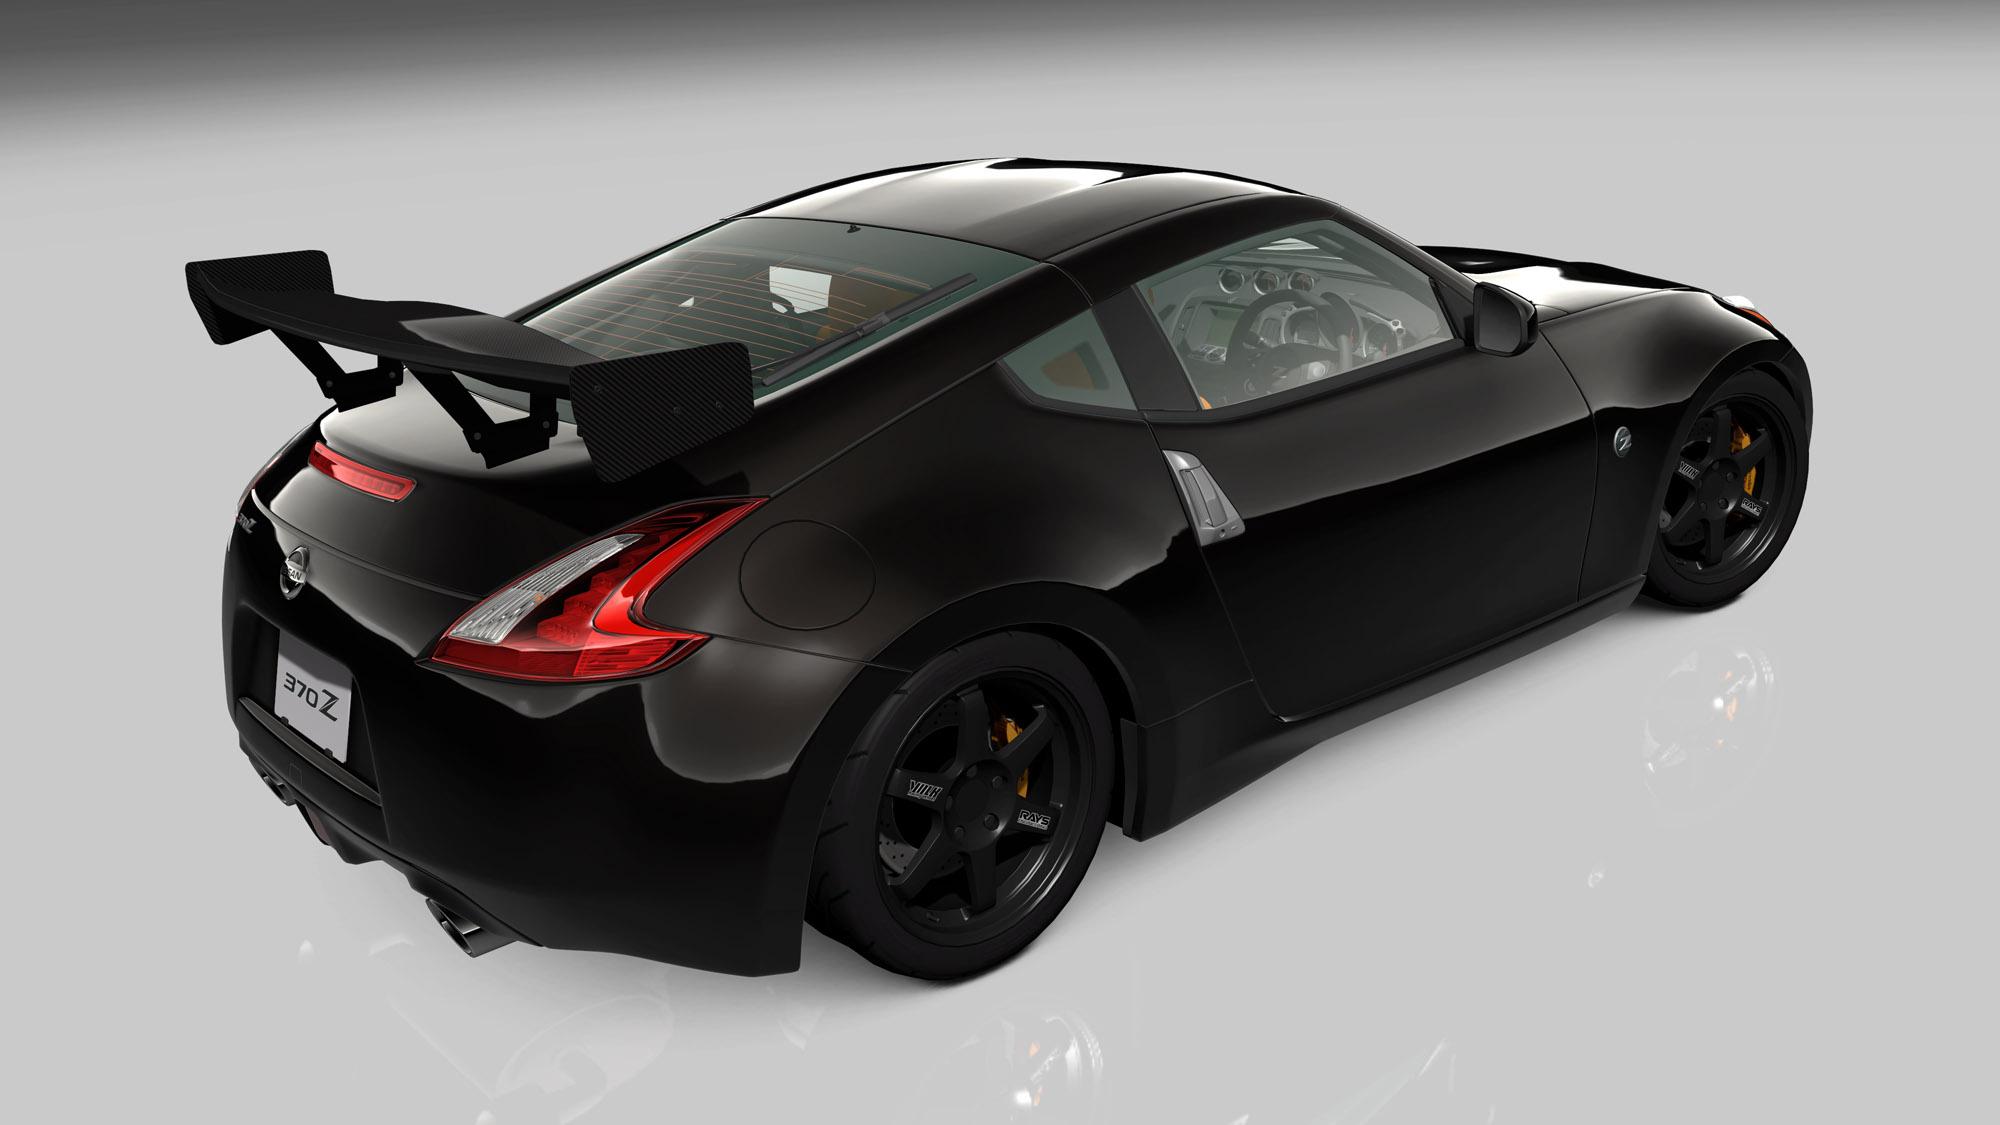 Gran Turismo 5 Gt Academy Demo Coming December 17th